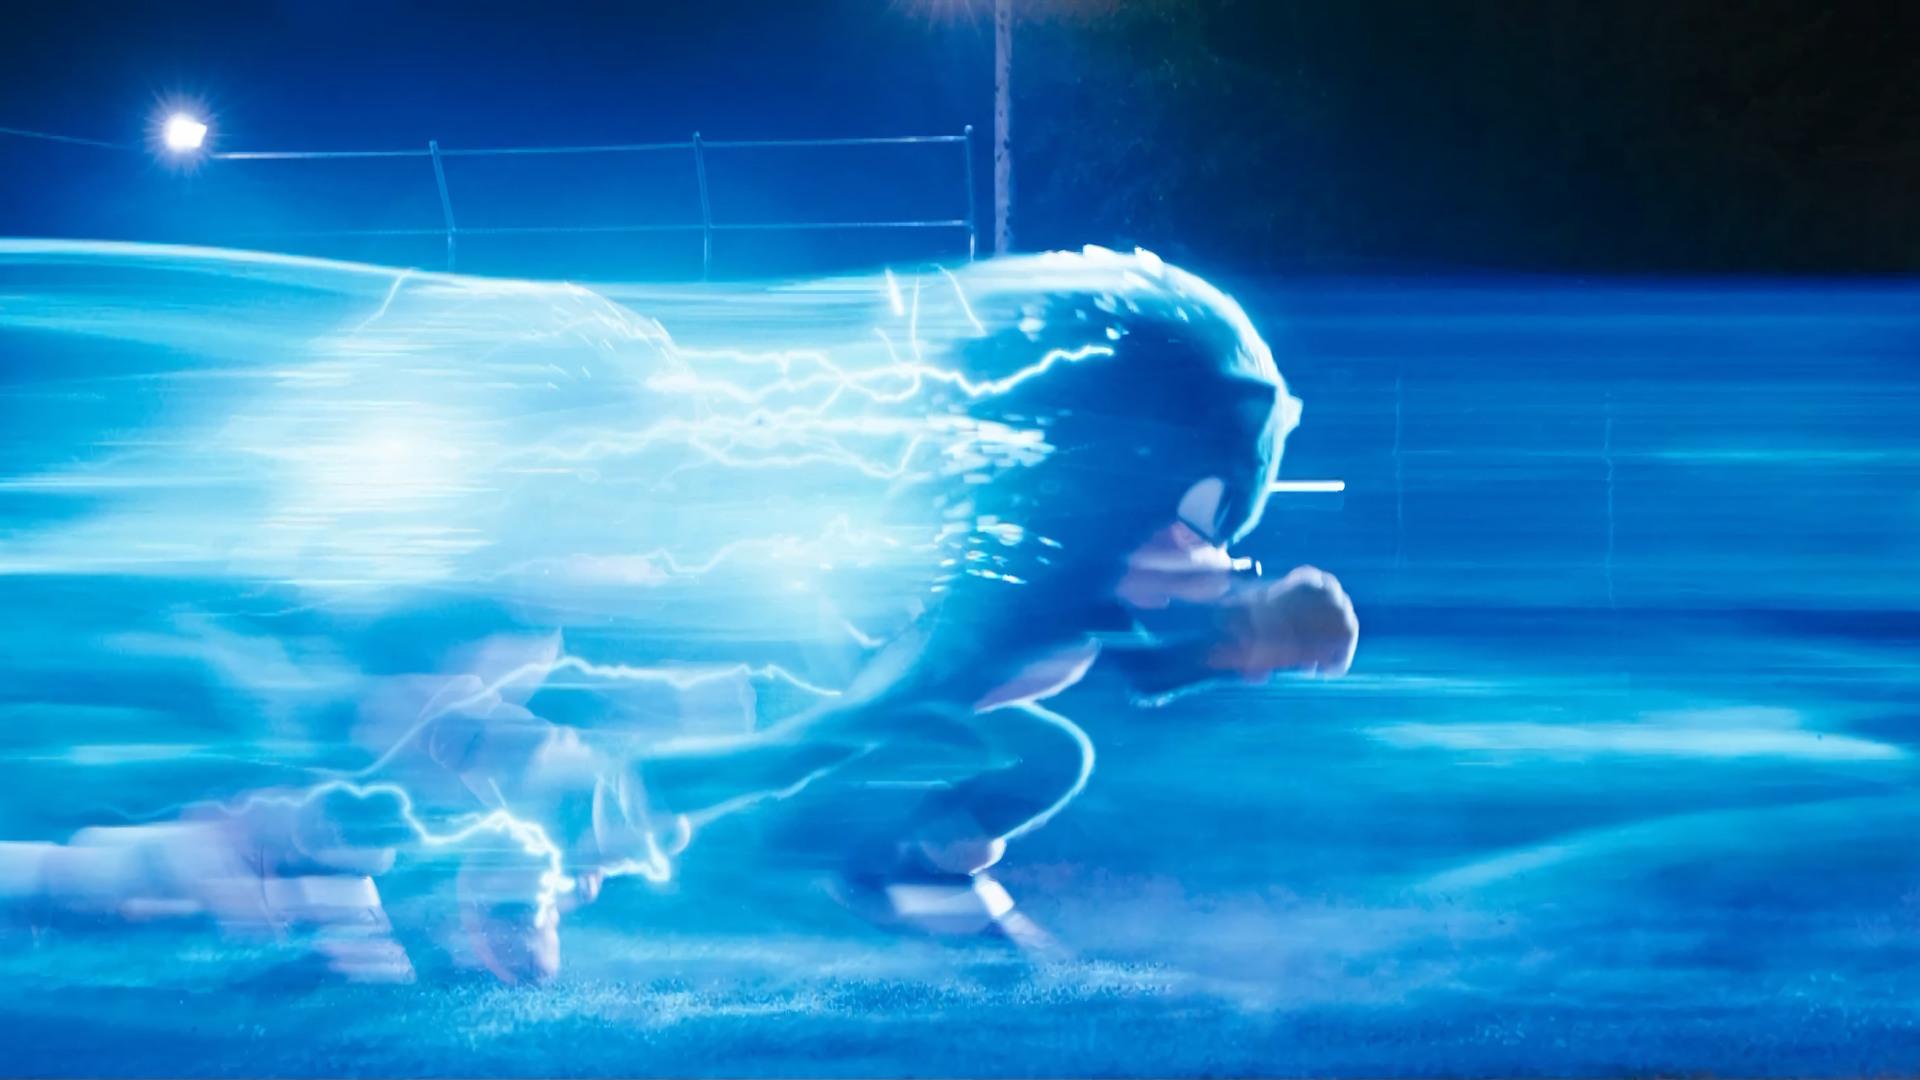 Sonic The Hedgehog Running New Movie 2020 4K Wallpaper 7266 1920x1080